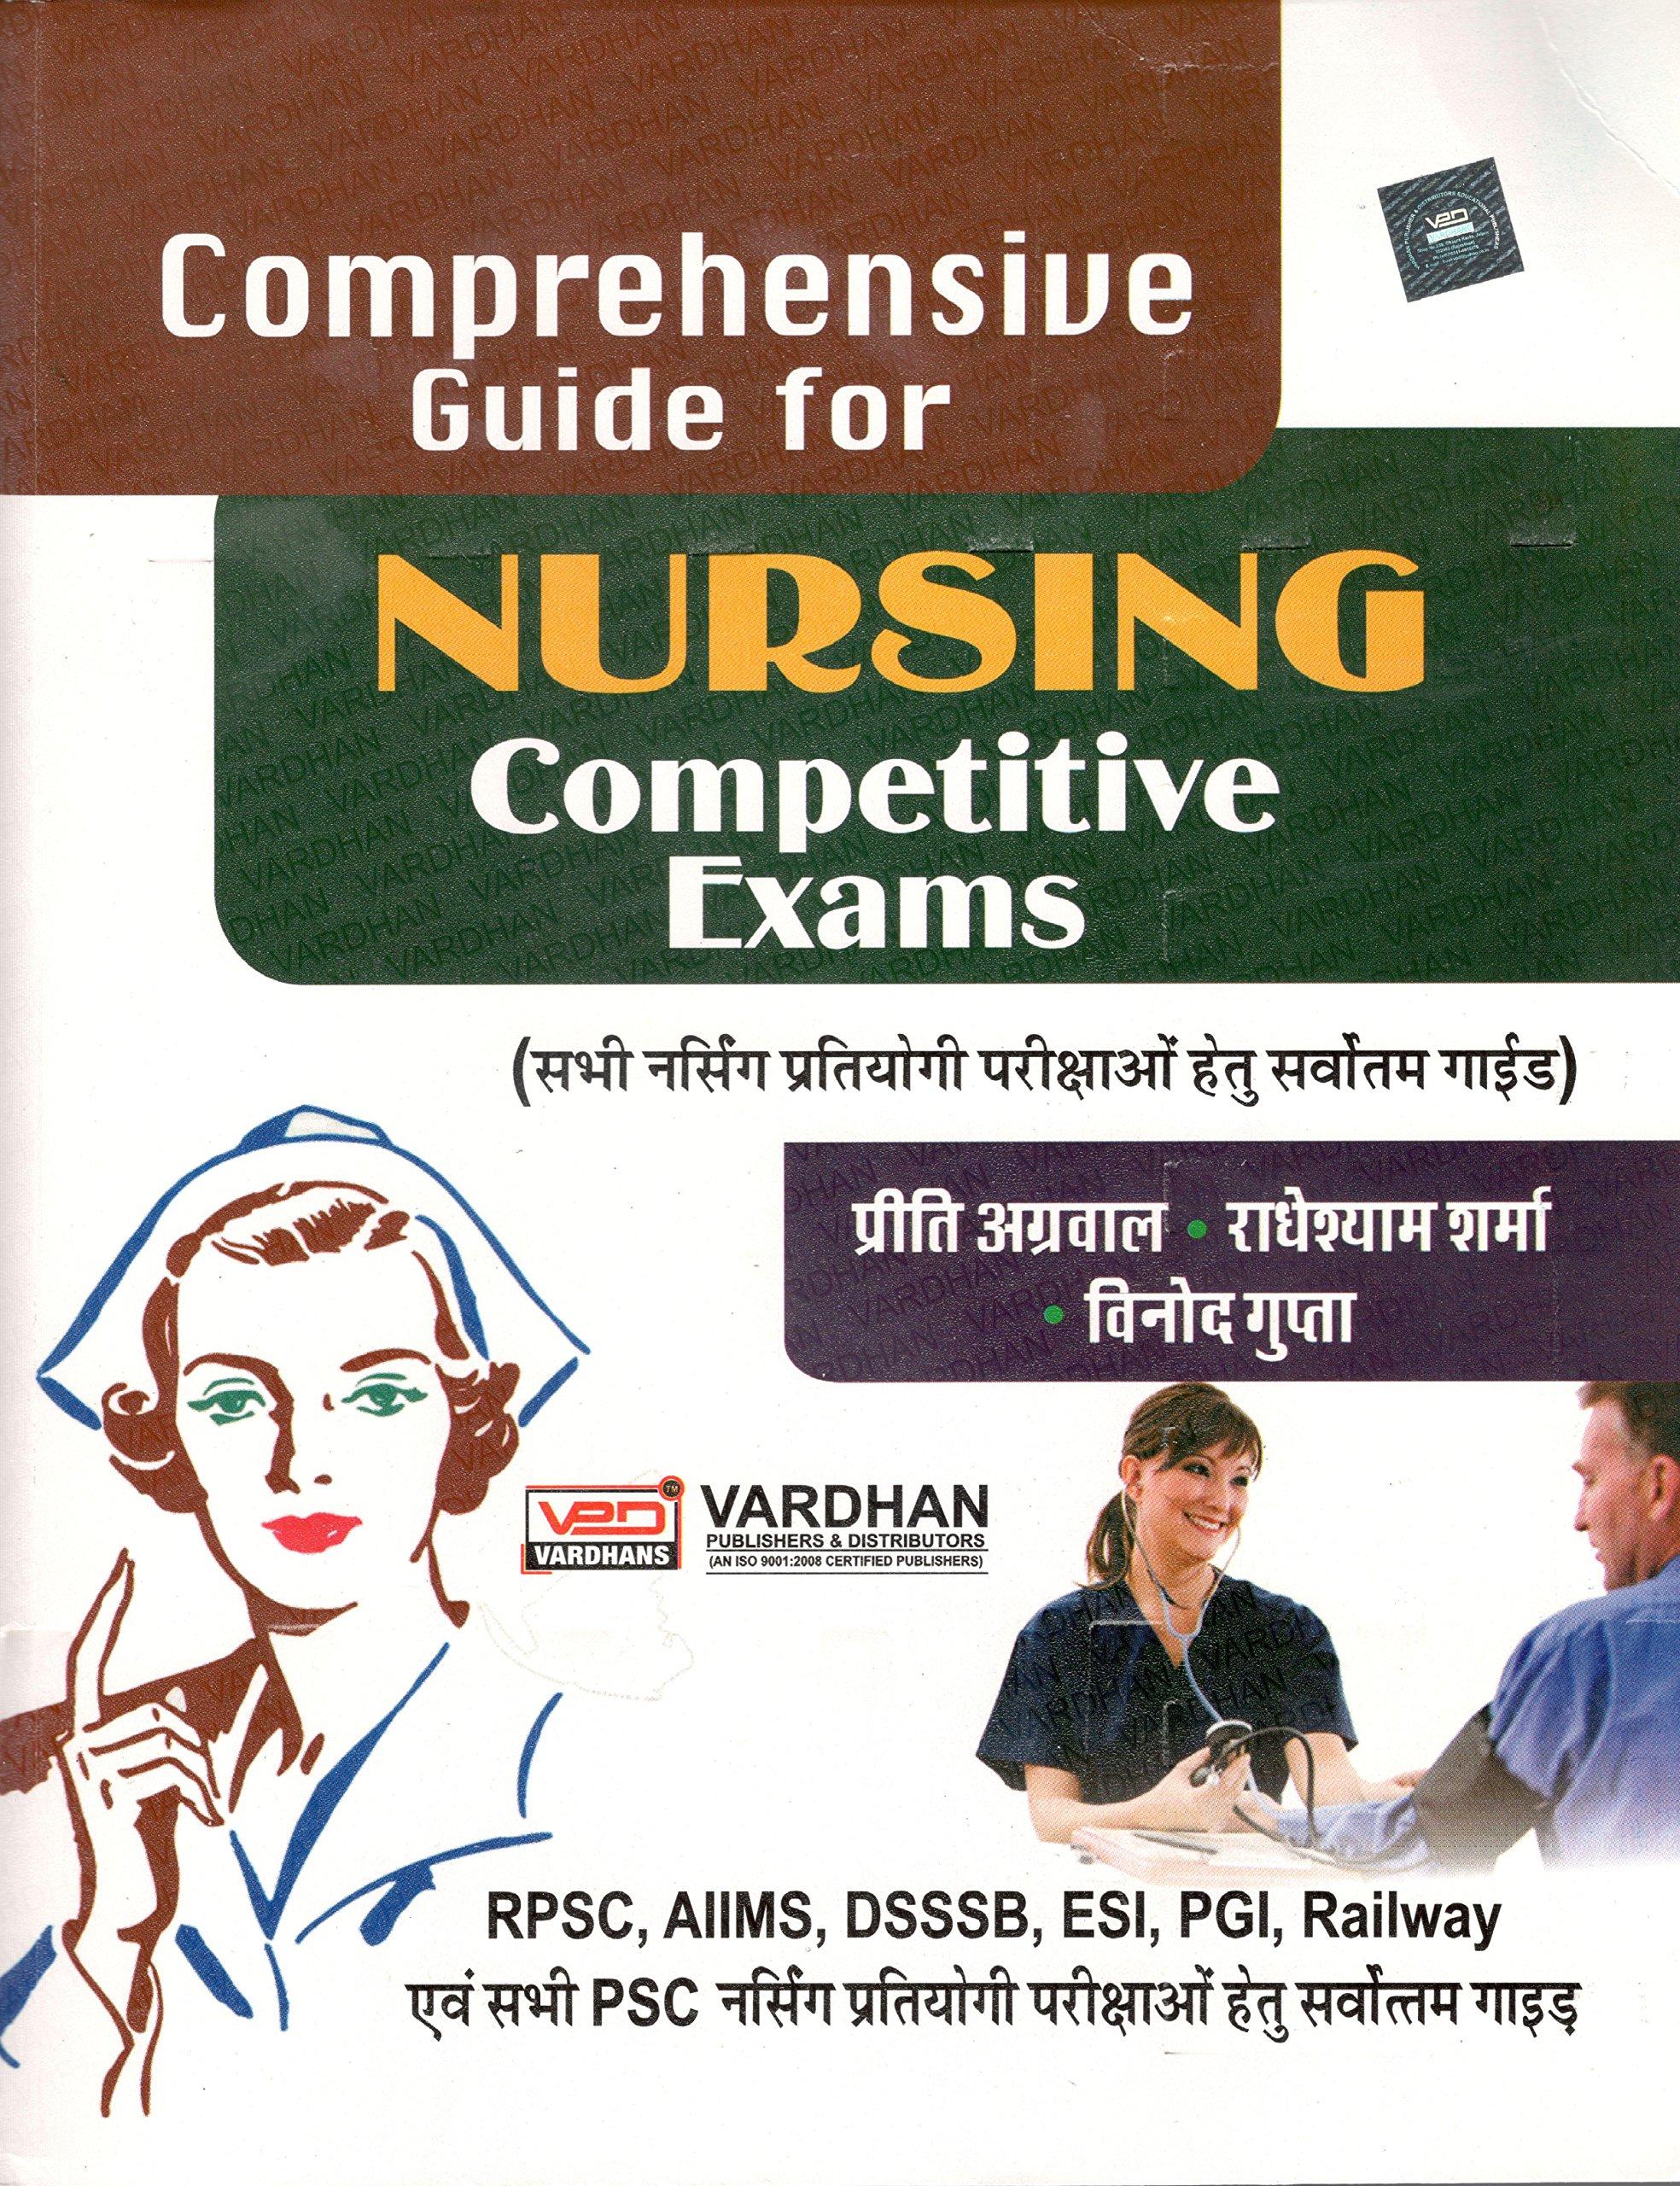 Nursing Exam Books Online In India Buy Books For Nursing Exam